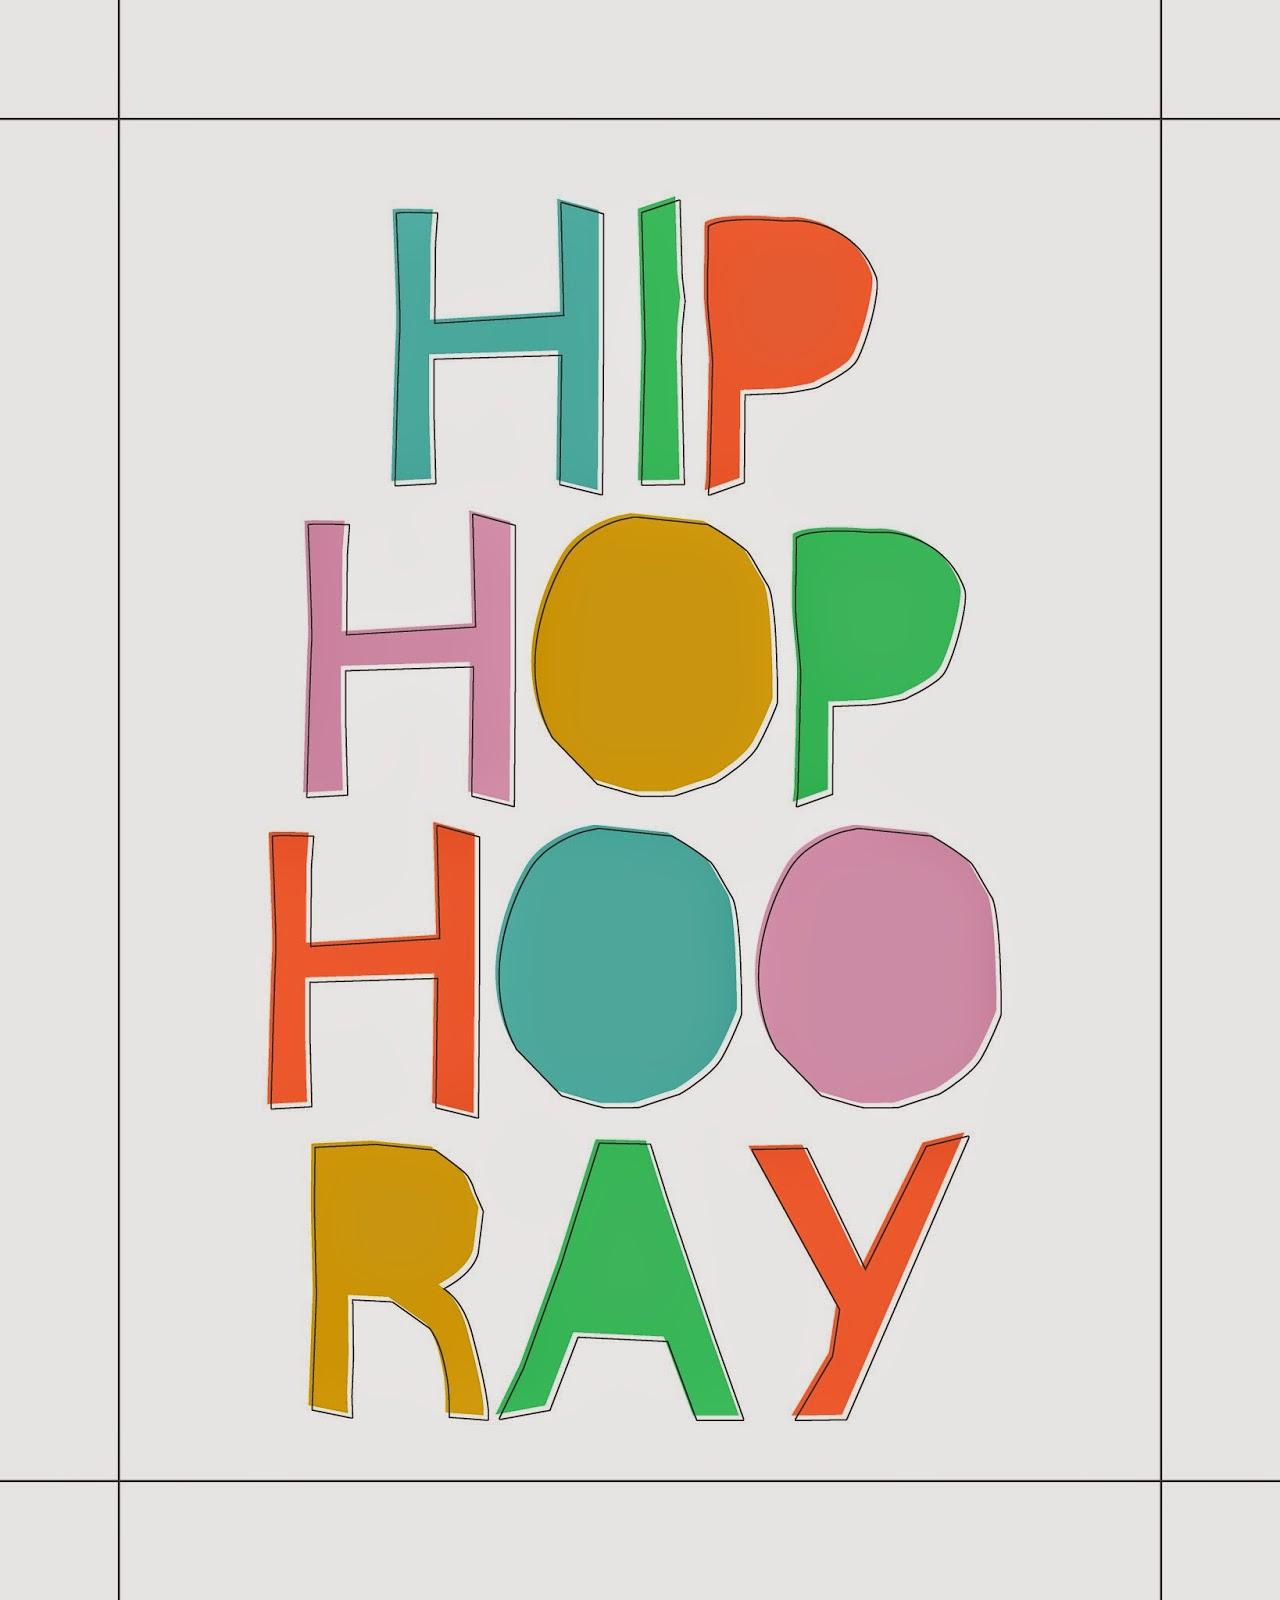 http://3.bp.blogspot.com/-xdK9Y46ZuT4/U0cXSSgNRVI/AAAAAAAALqk/uM3dDLIHMeI/s1600/hip+hop+hooray+print.jpg